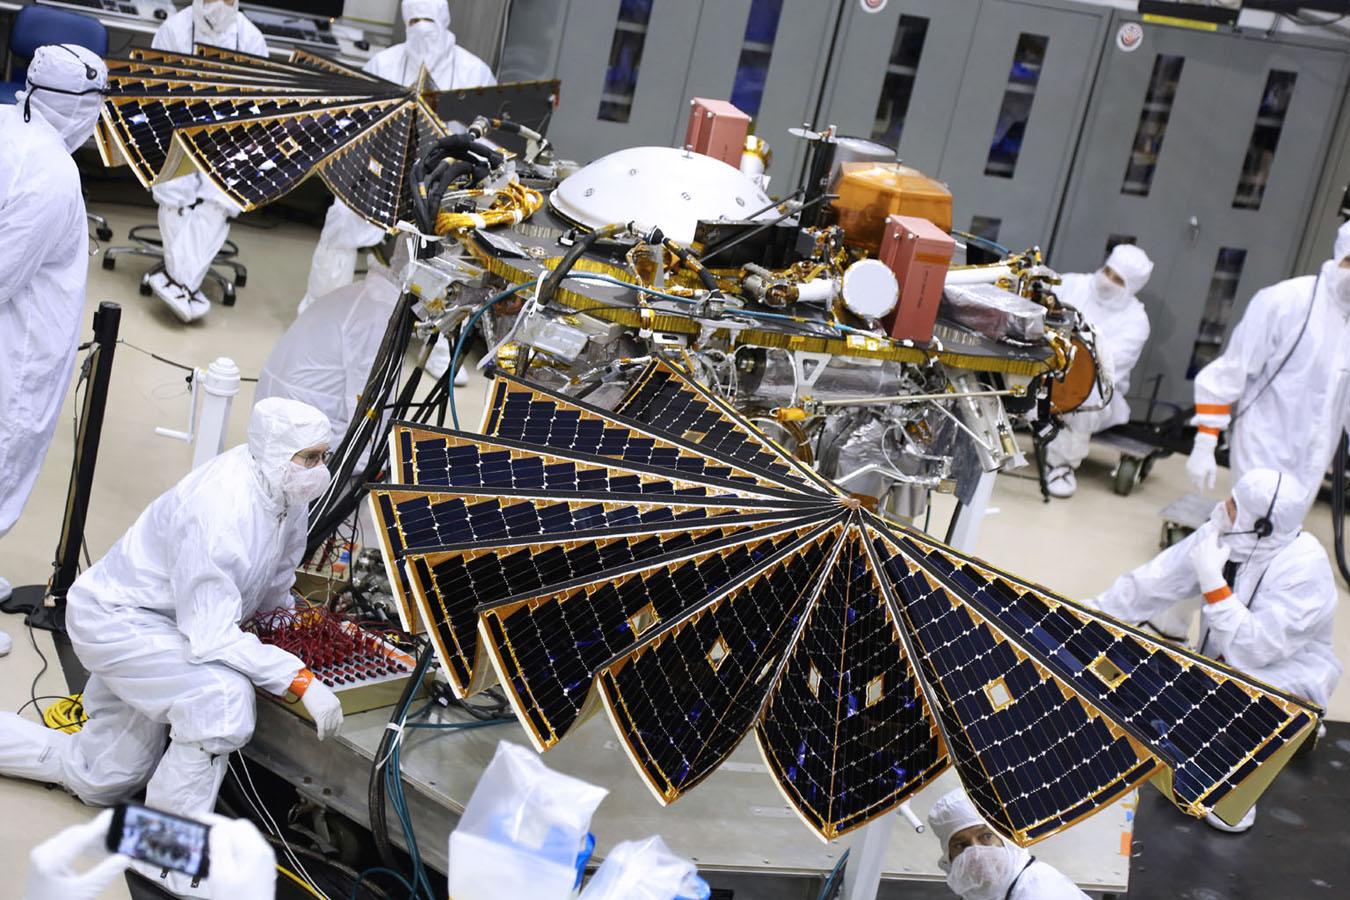 mars rover insight update - photo #37